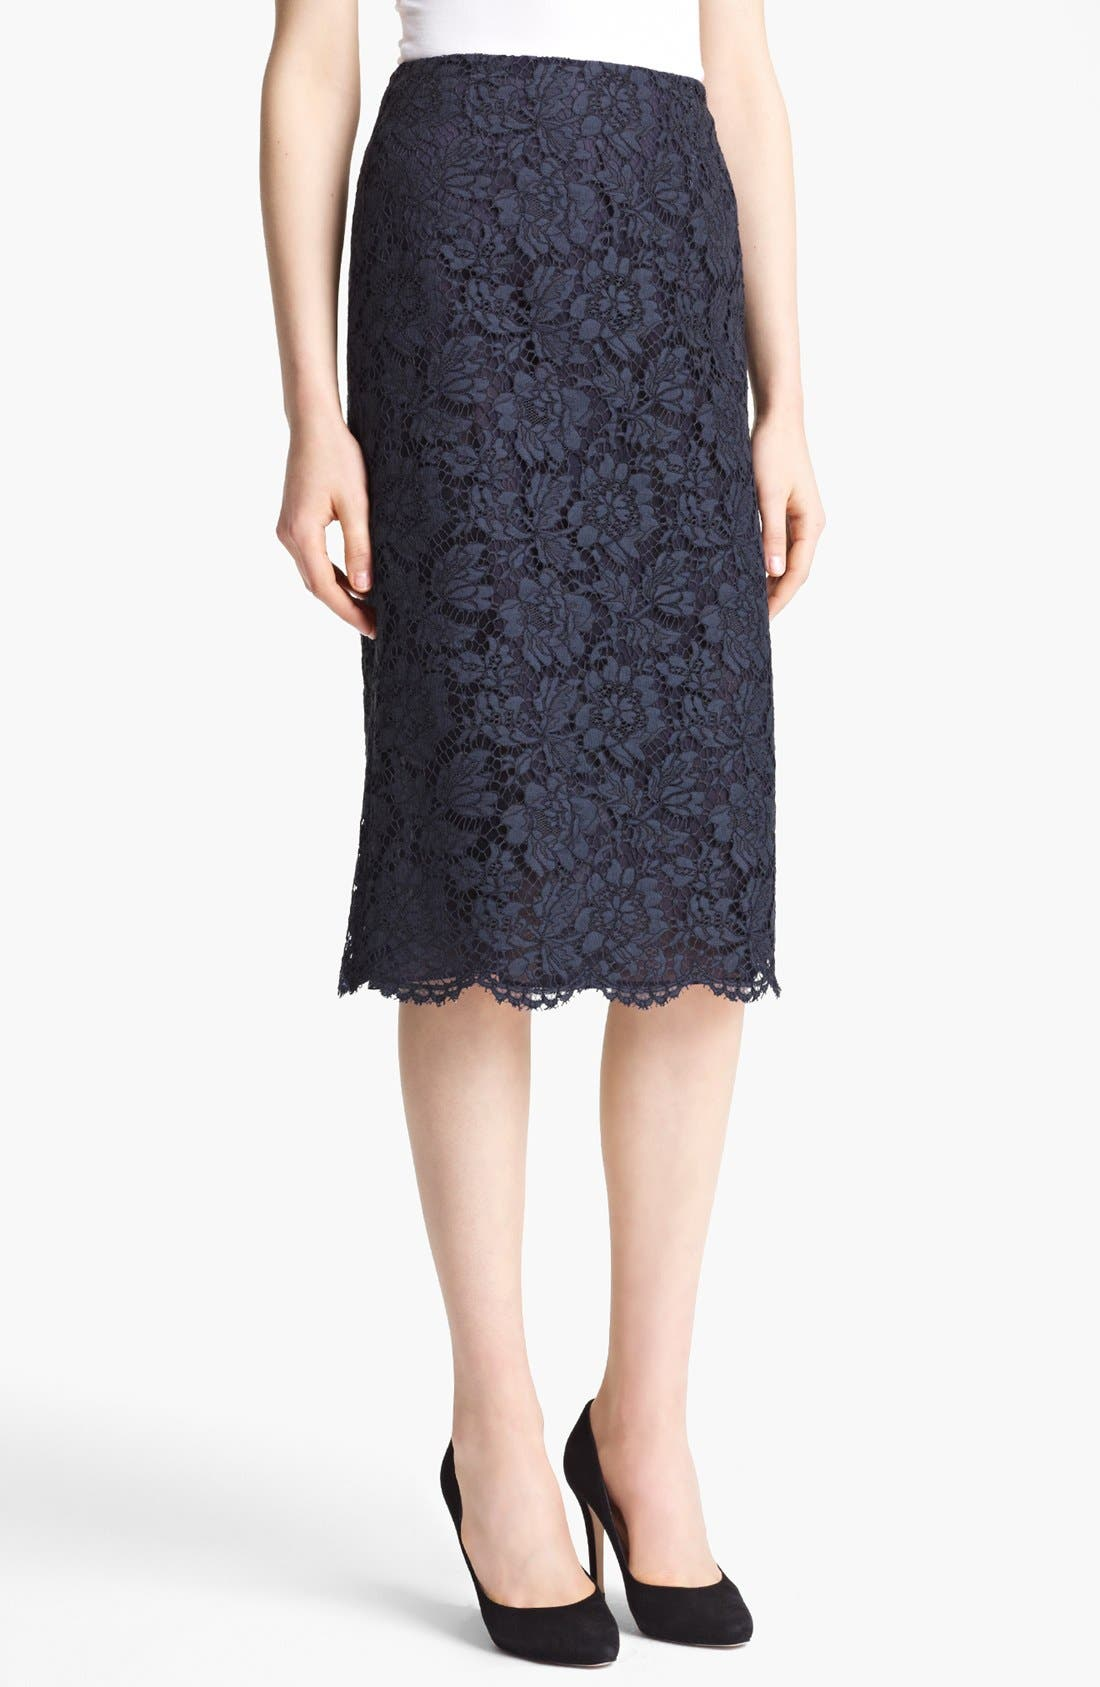 Alternate Image 1 Selected - Valentino Tubino Lace Skirt